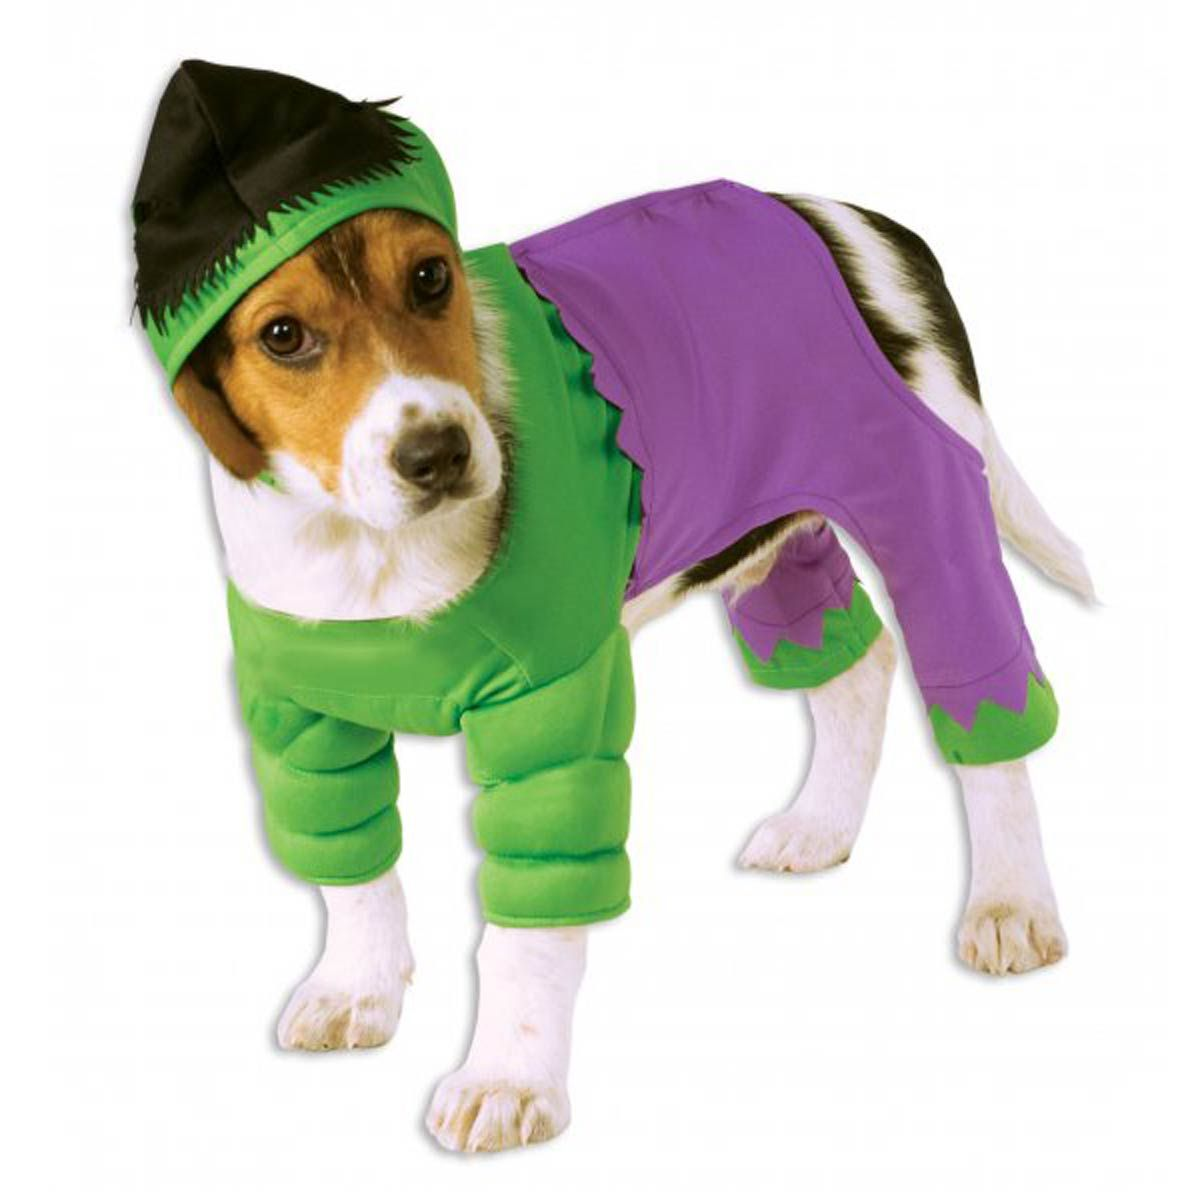 Marvel Hulk Dog Costume Pet Costumes Dog Halloween Costumes